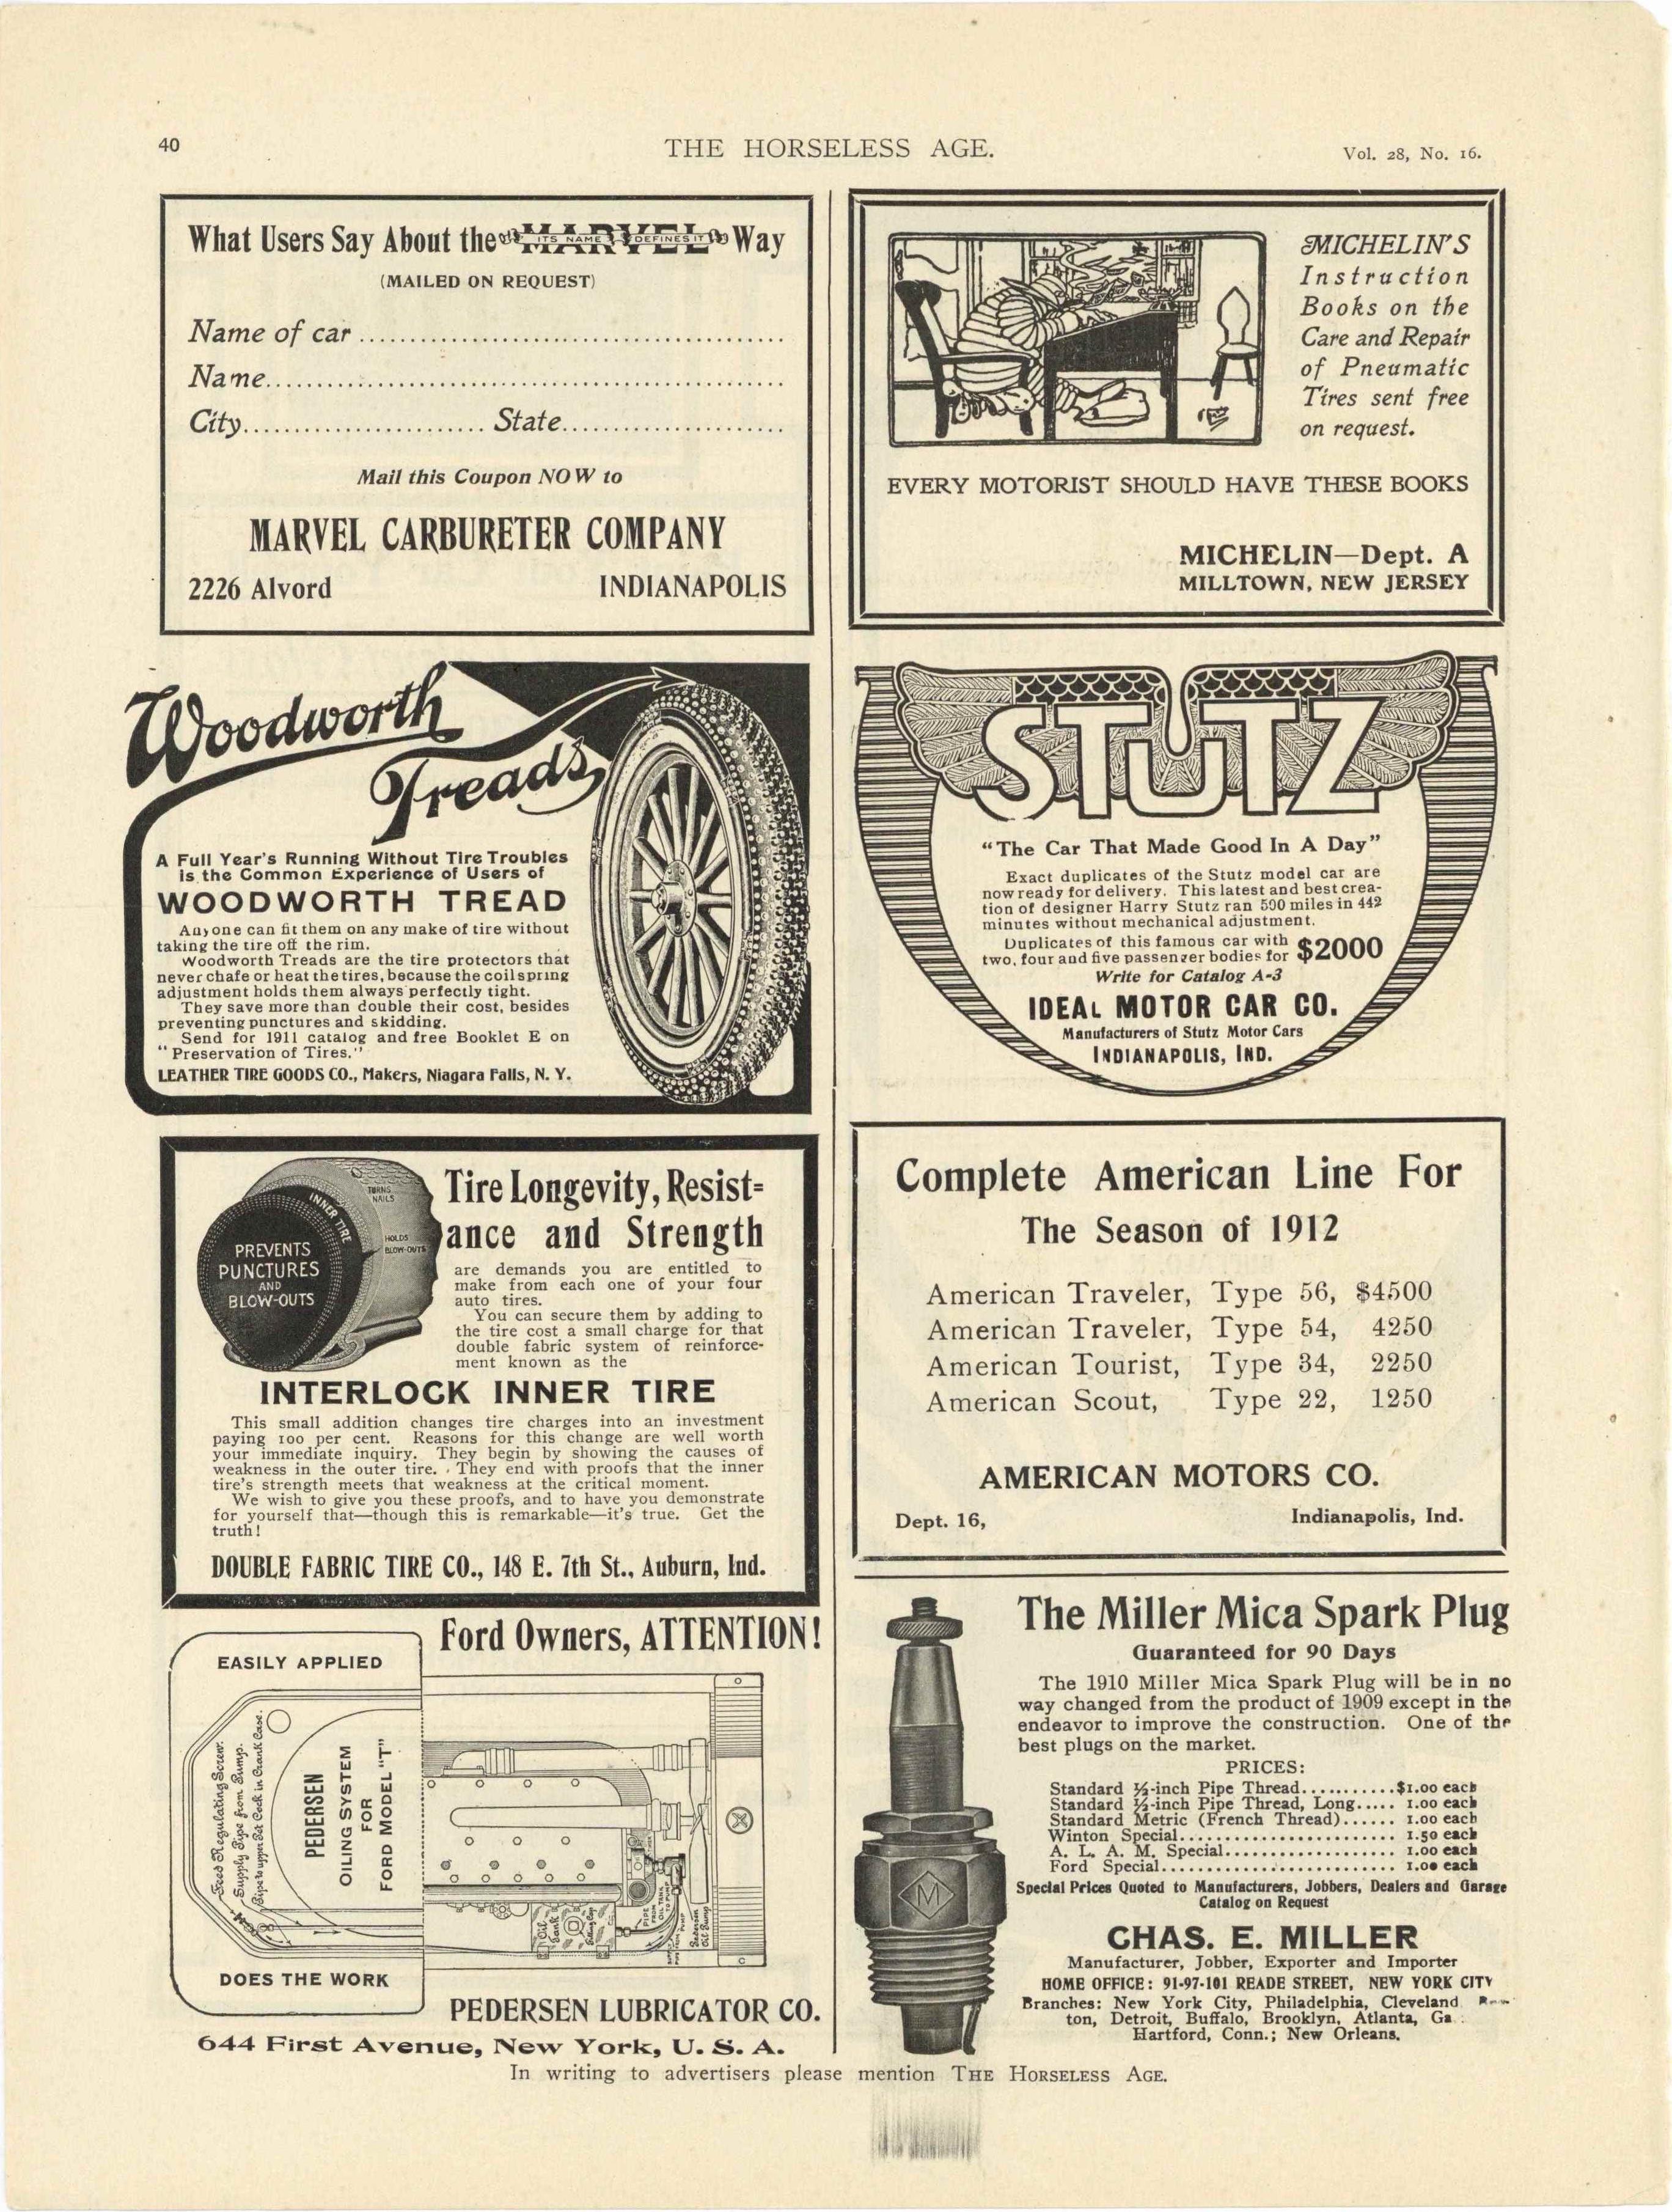 1911-ind-american-10-18-p-40-bz